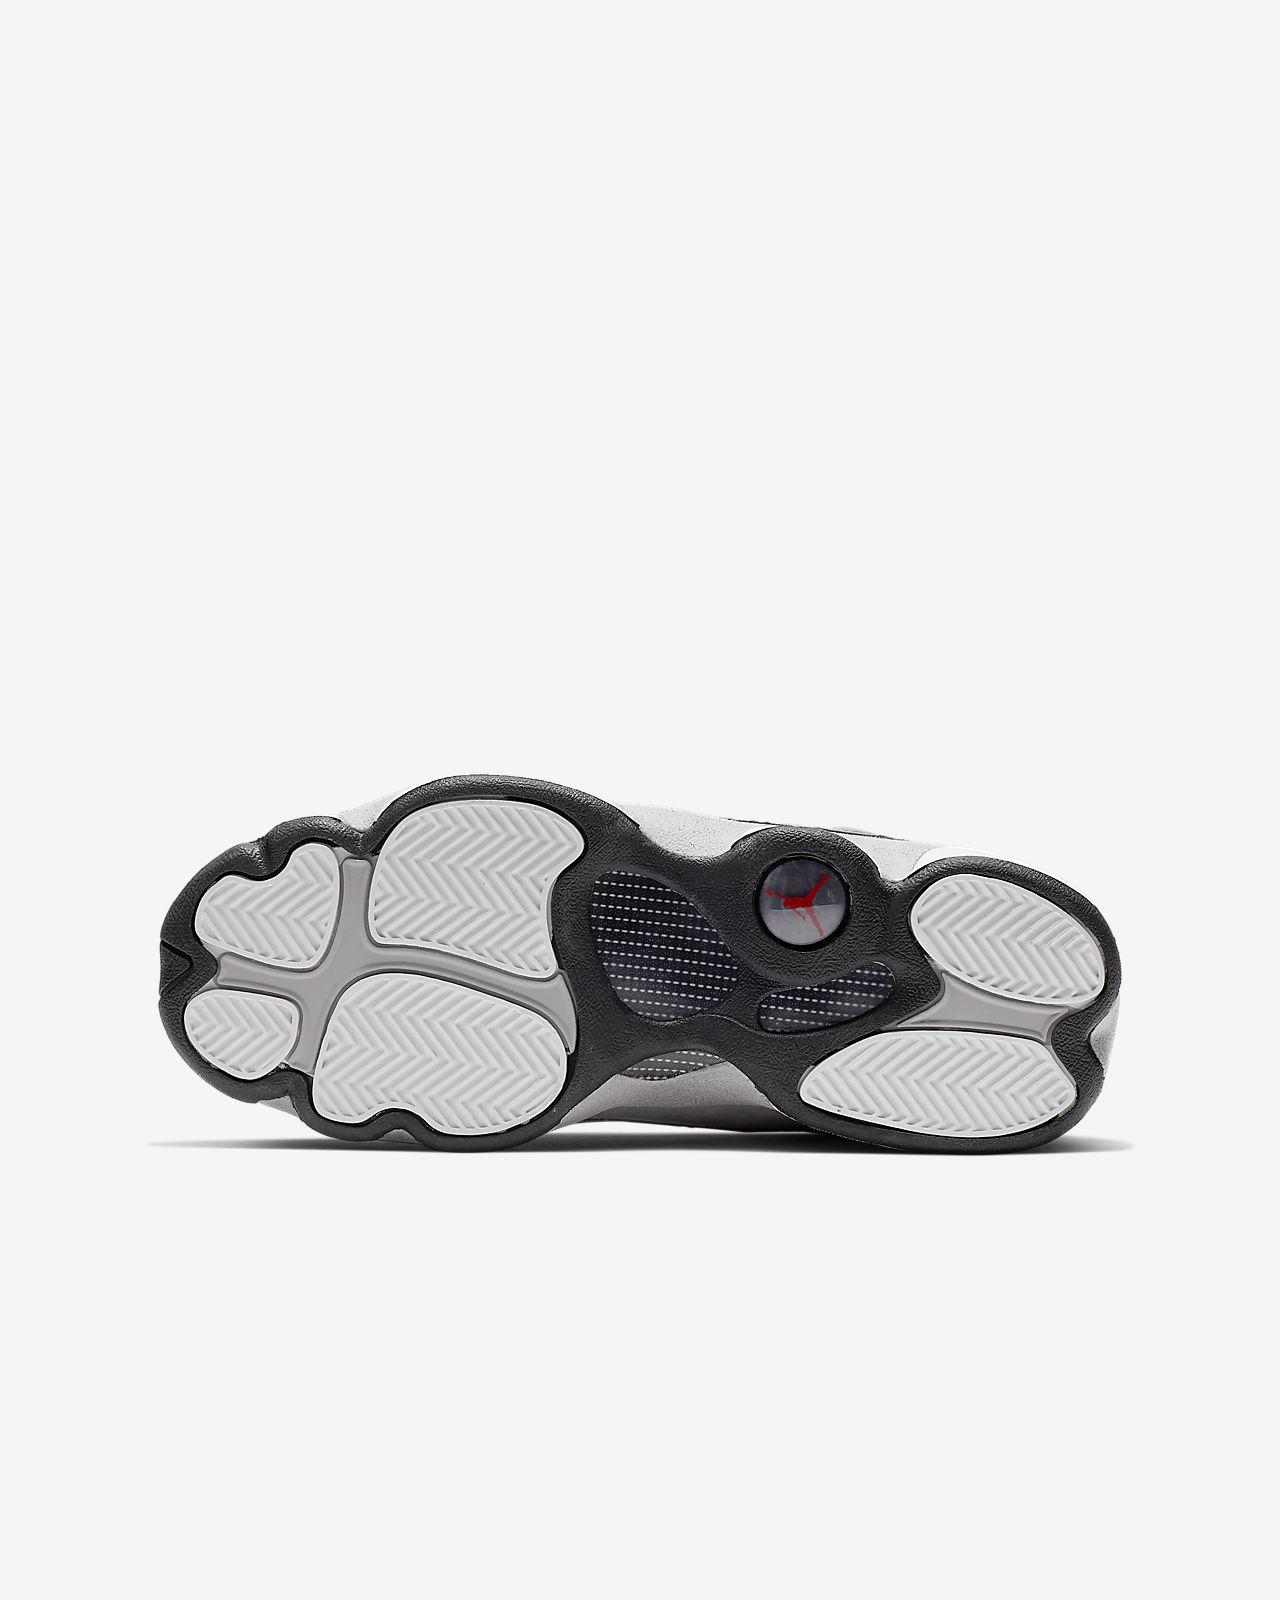 f913414d6b1 Air Jordan 13 Retro Big Kids' Shoe. Nike.com